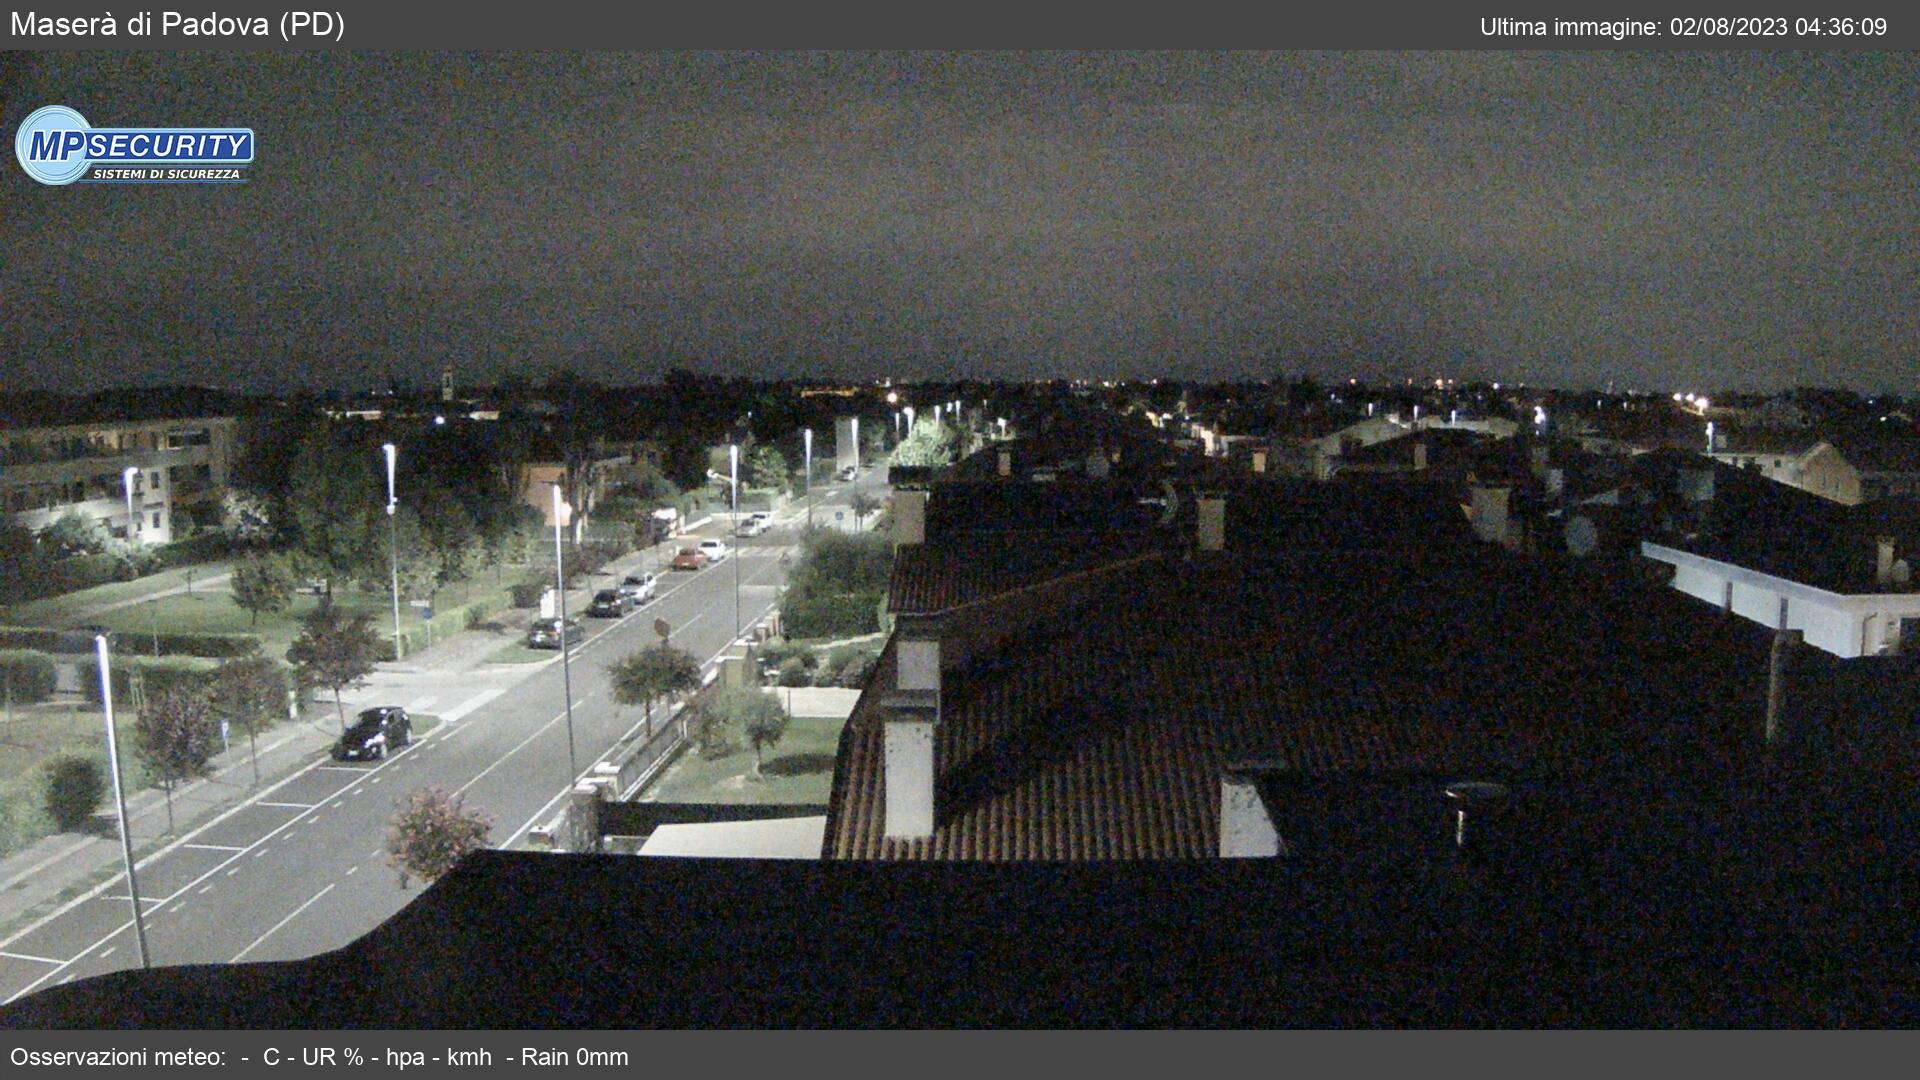 Webcam maser di padova live 3b meteo - 3b meteo bagno di romagna ...